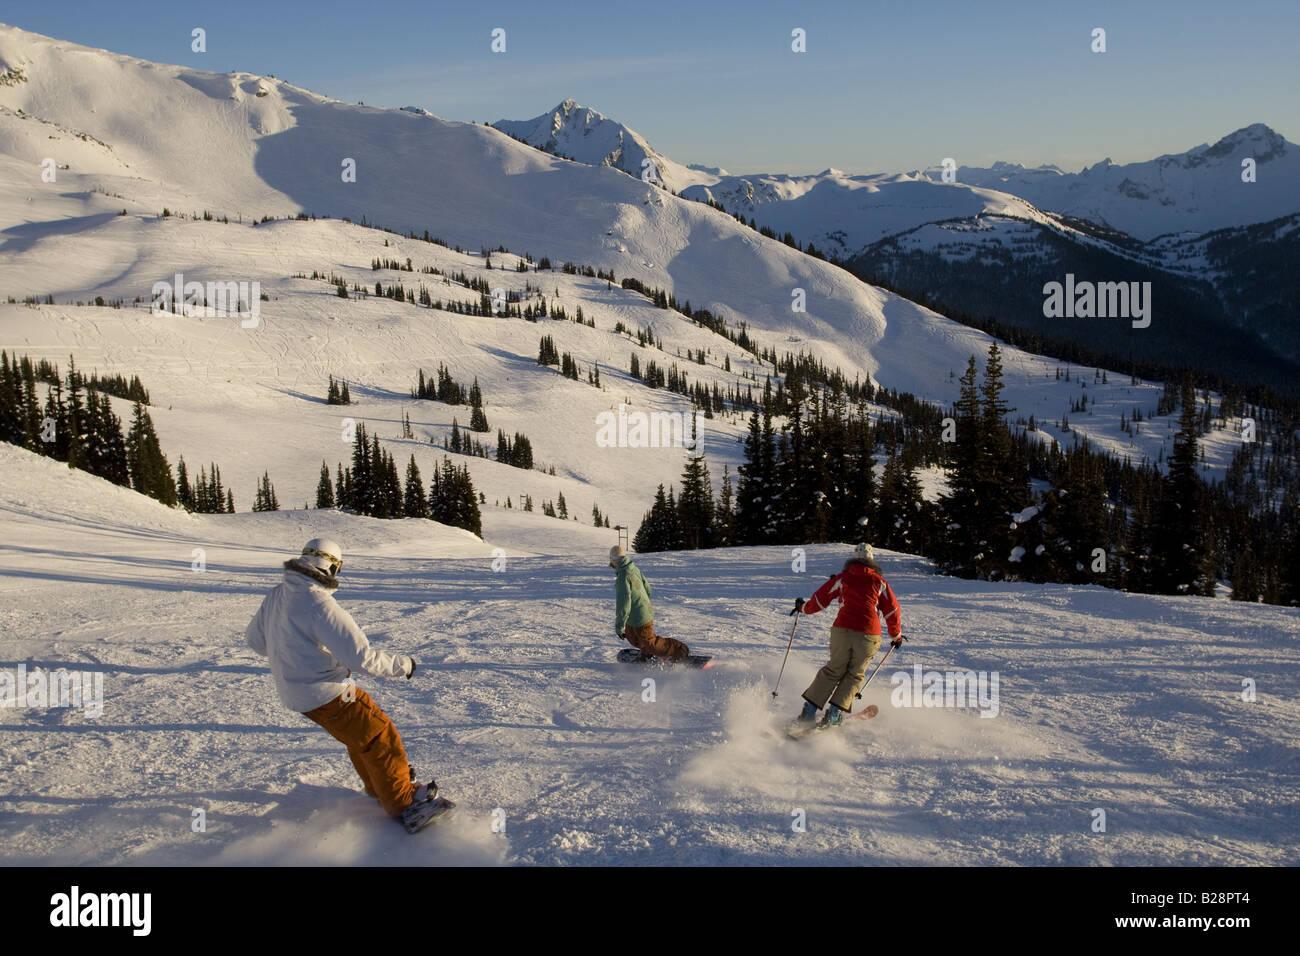 Enjoying skiing on groomed runs Whistler British Columbia Canada - Stock Image